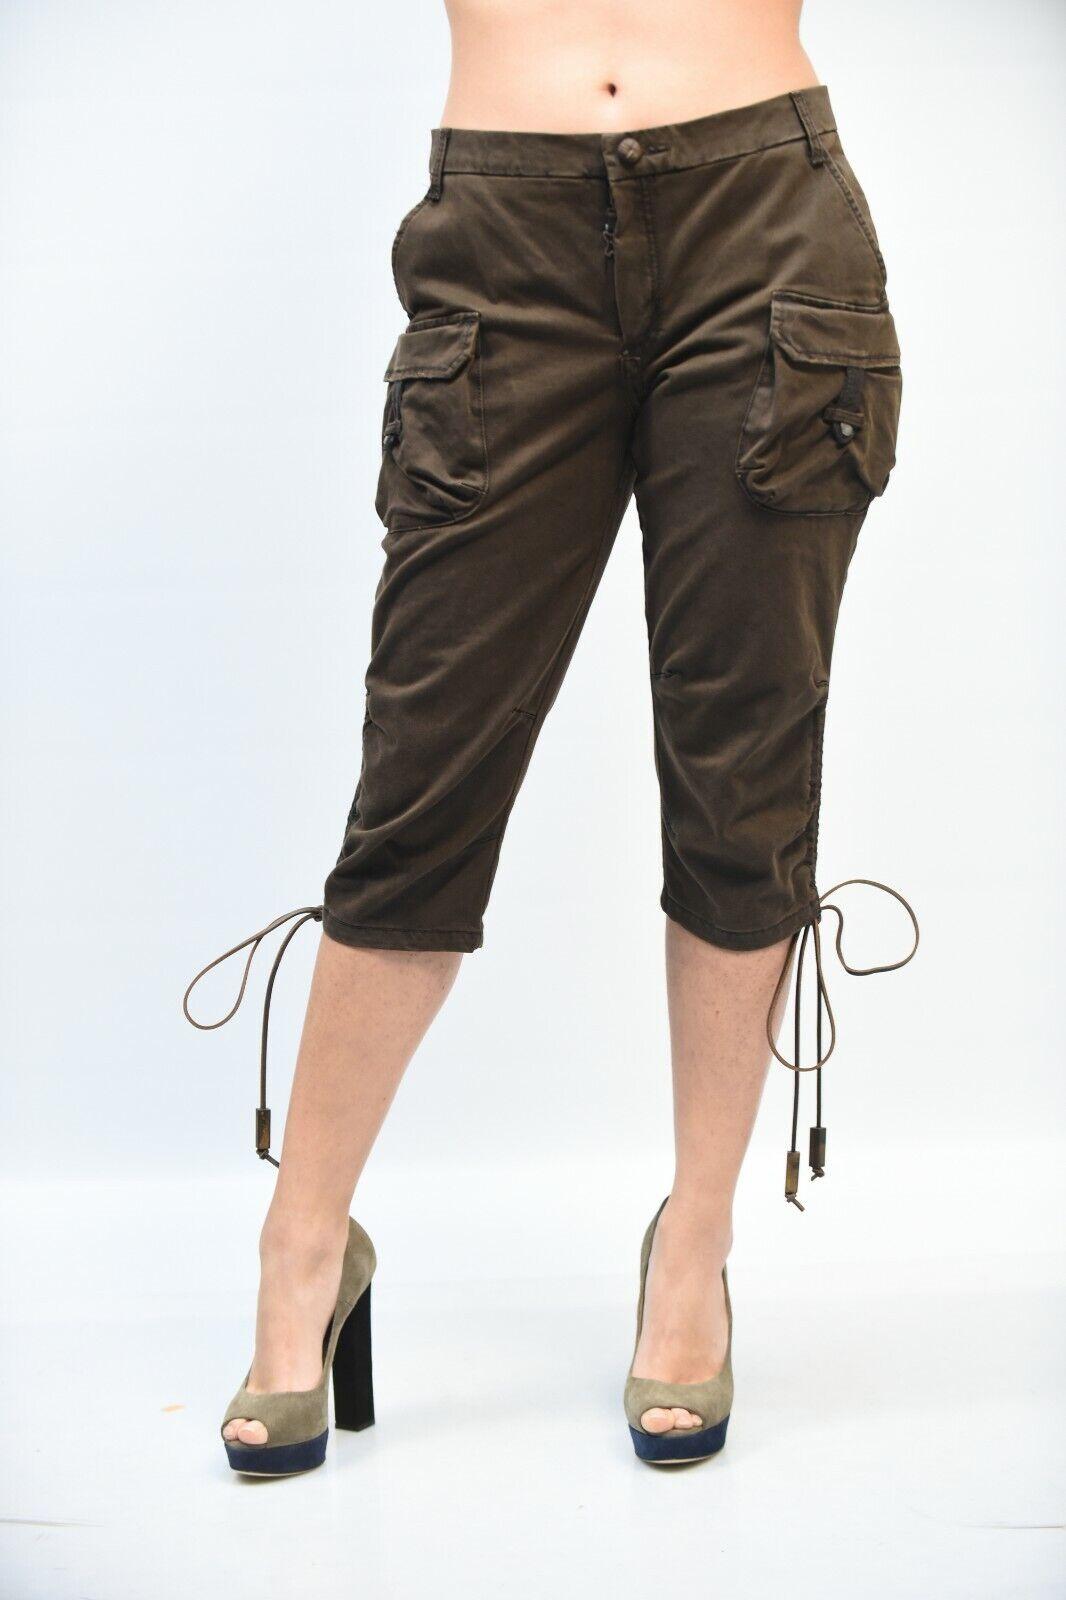 BERMUDA  - 50% women FRANKIE MORELLO D051 1258 brown MIS.38 AA